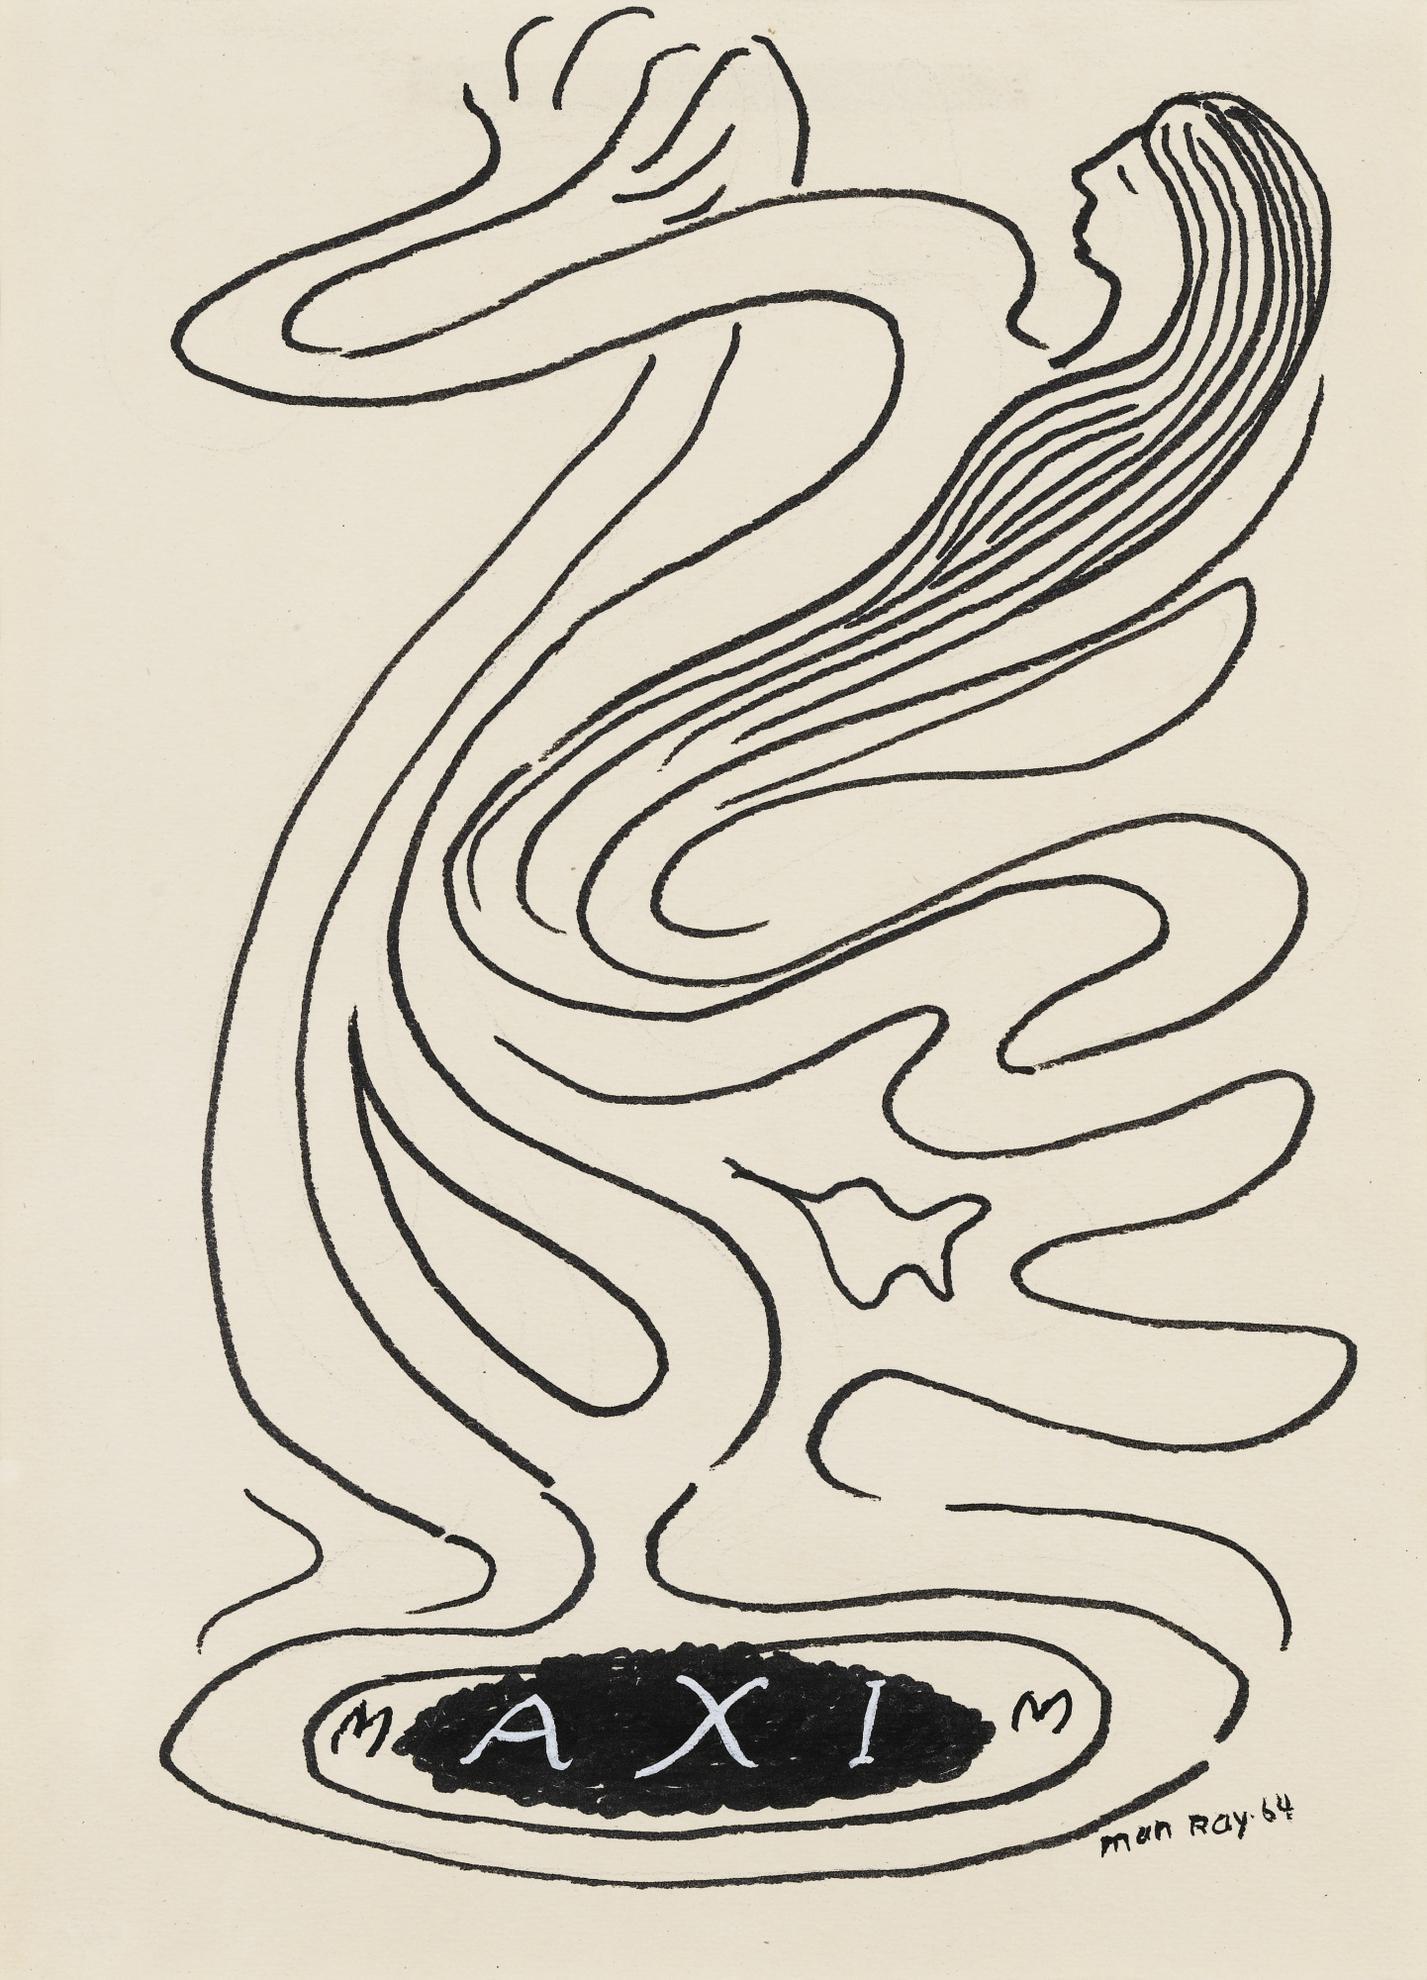 Man Ray-Maxim-1964